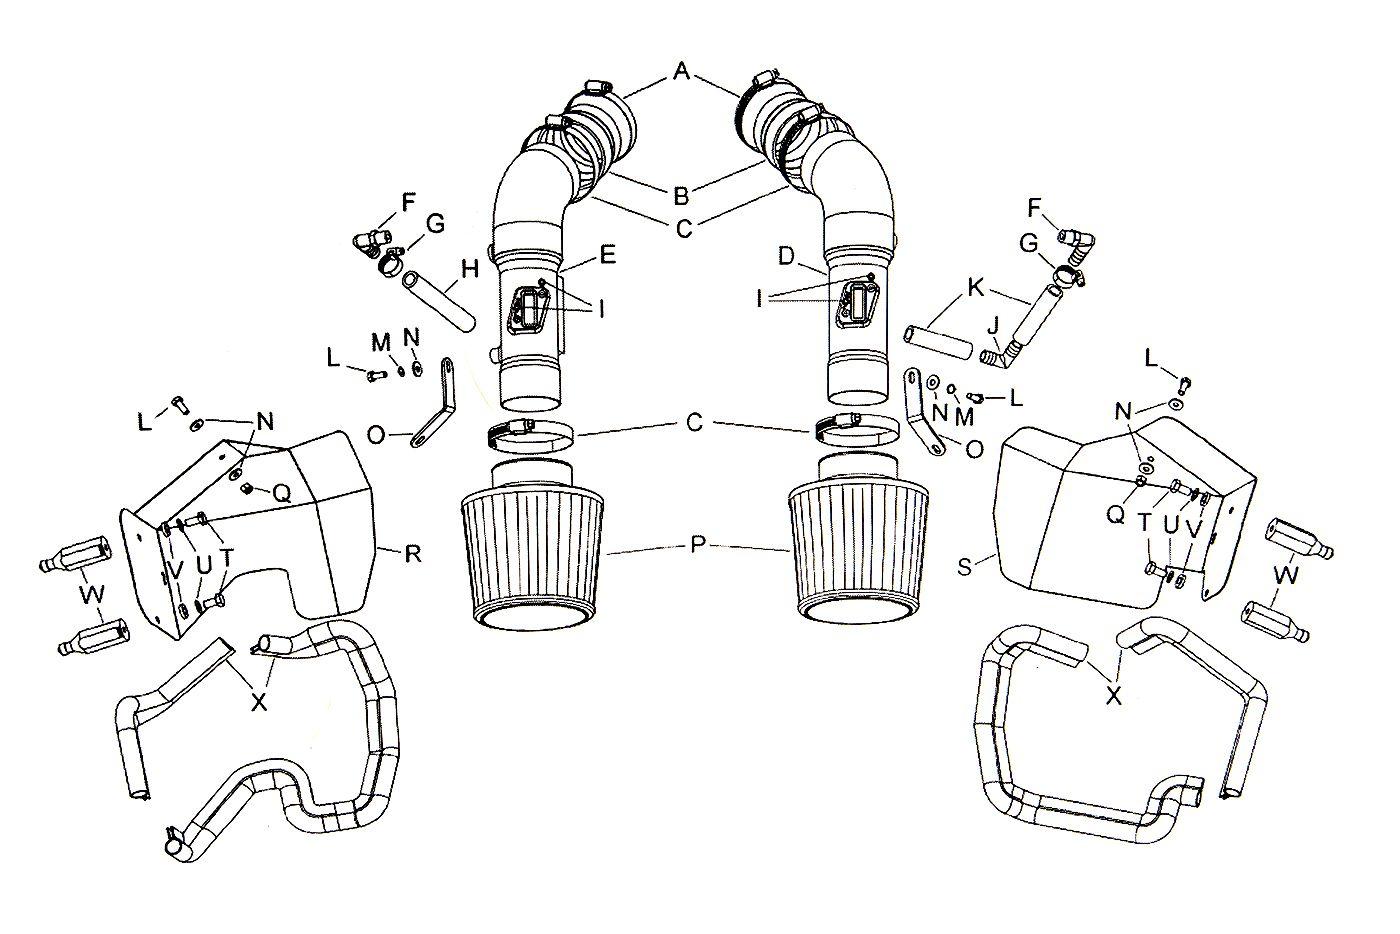 Nismo R Tune Dual Short Ram Cold Air Intake Kit